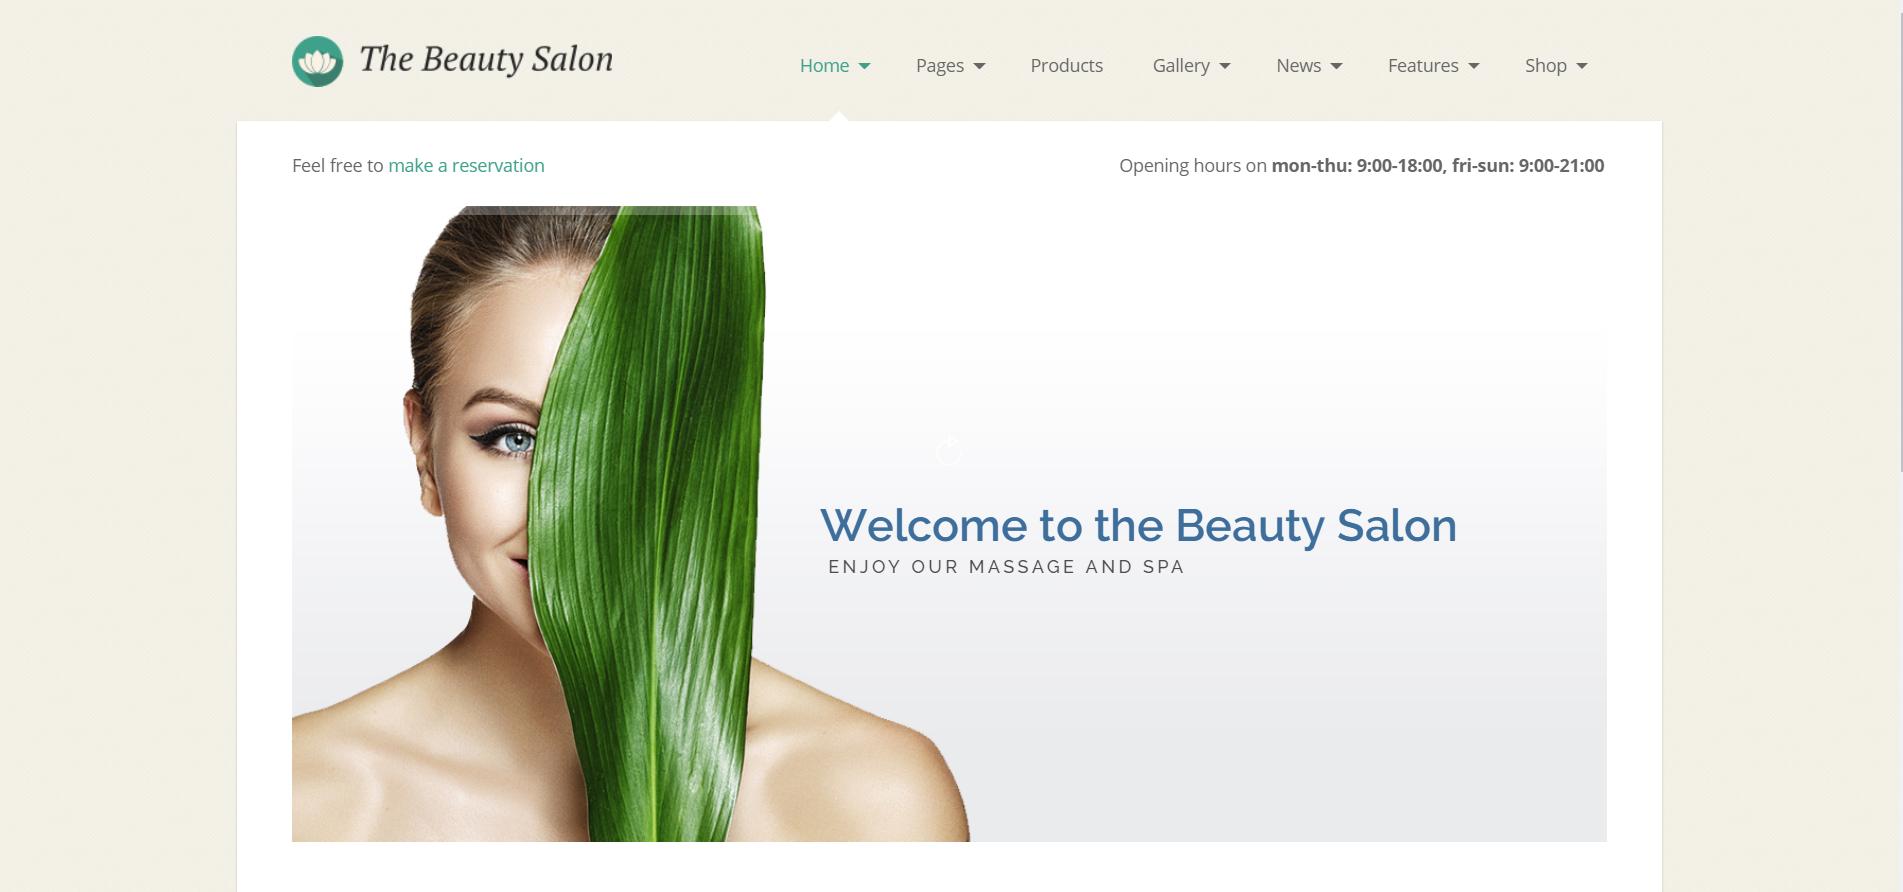 14. The Beauty Salon